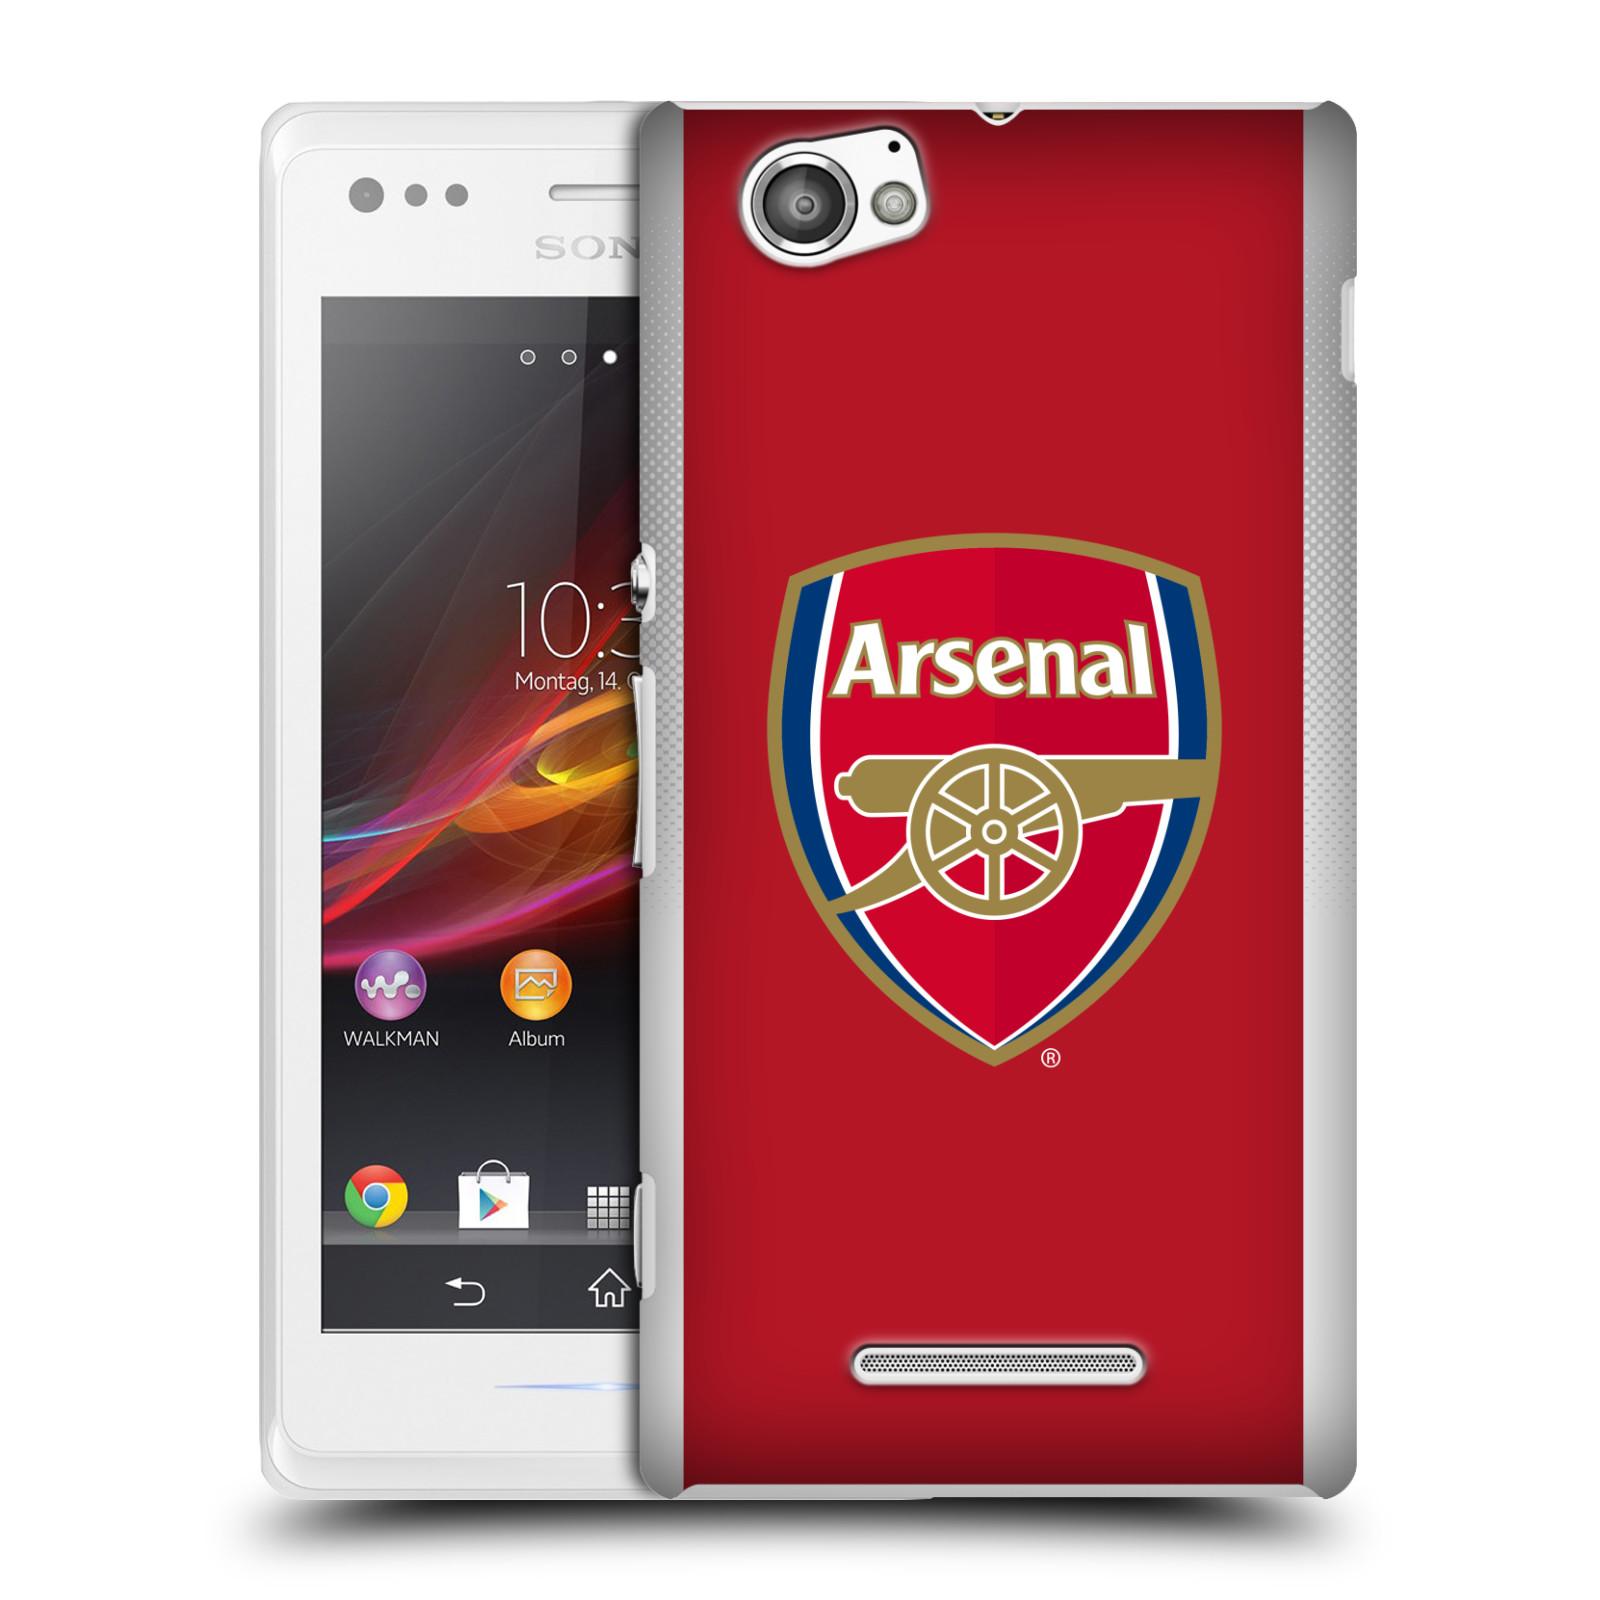 Plastové pouzdro na mobil Sony Xperia M C1905 - Head Case - Arsenal FC - Logo klubu